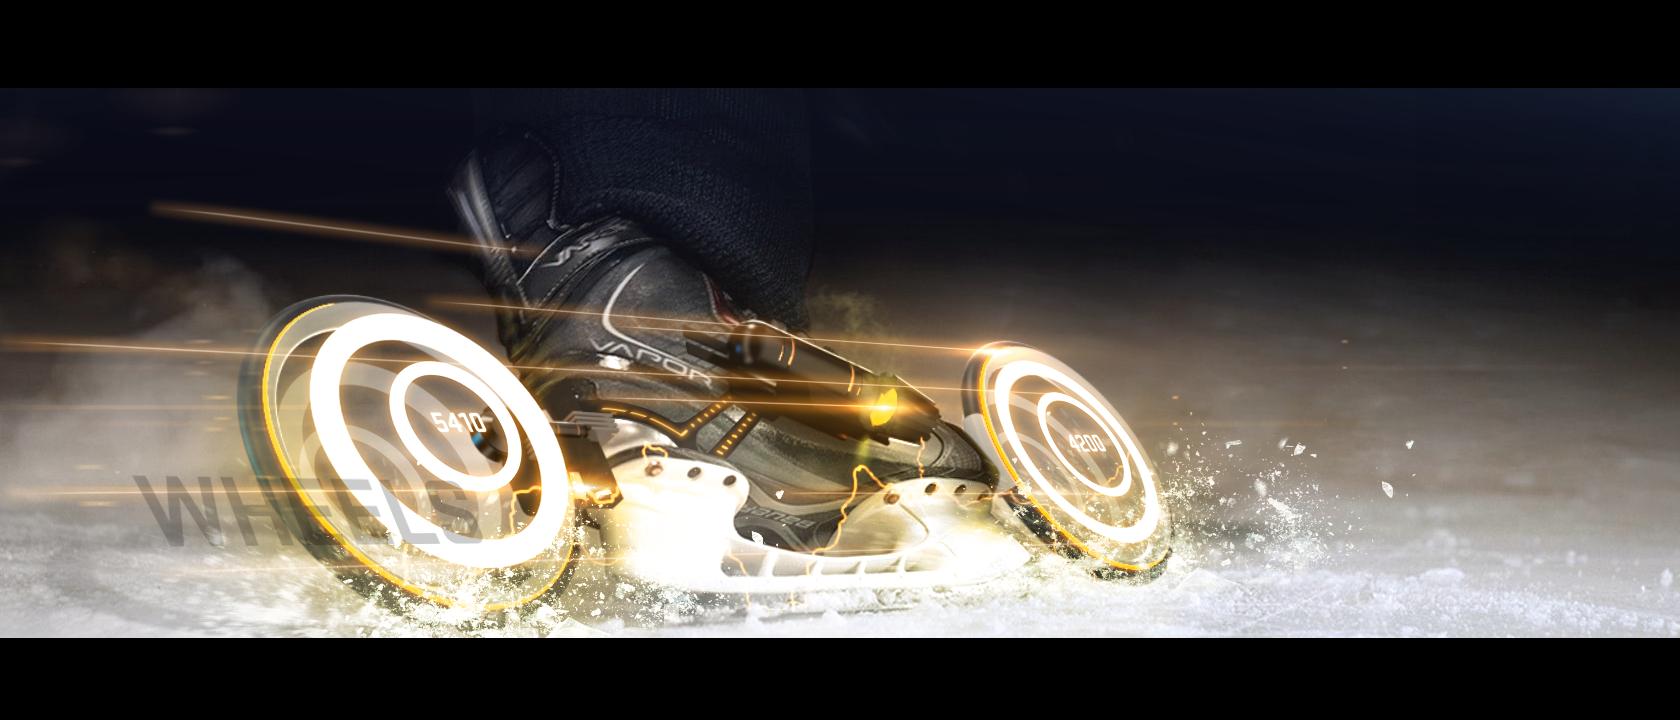 Ice_skate_wheels_00000